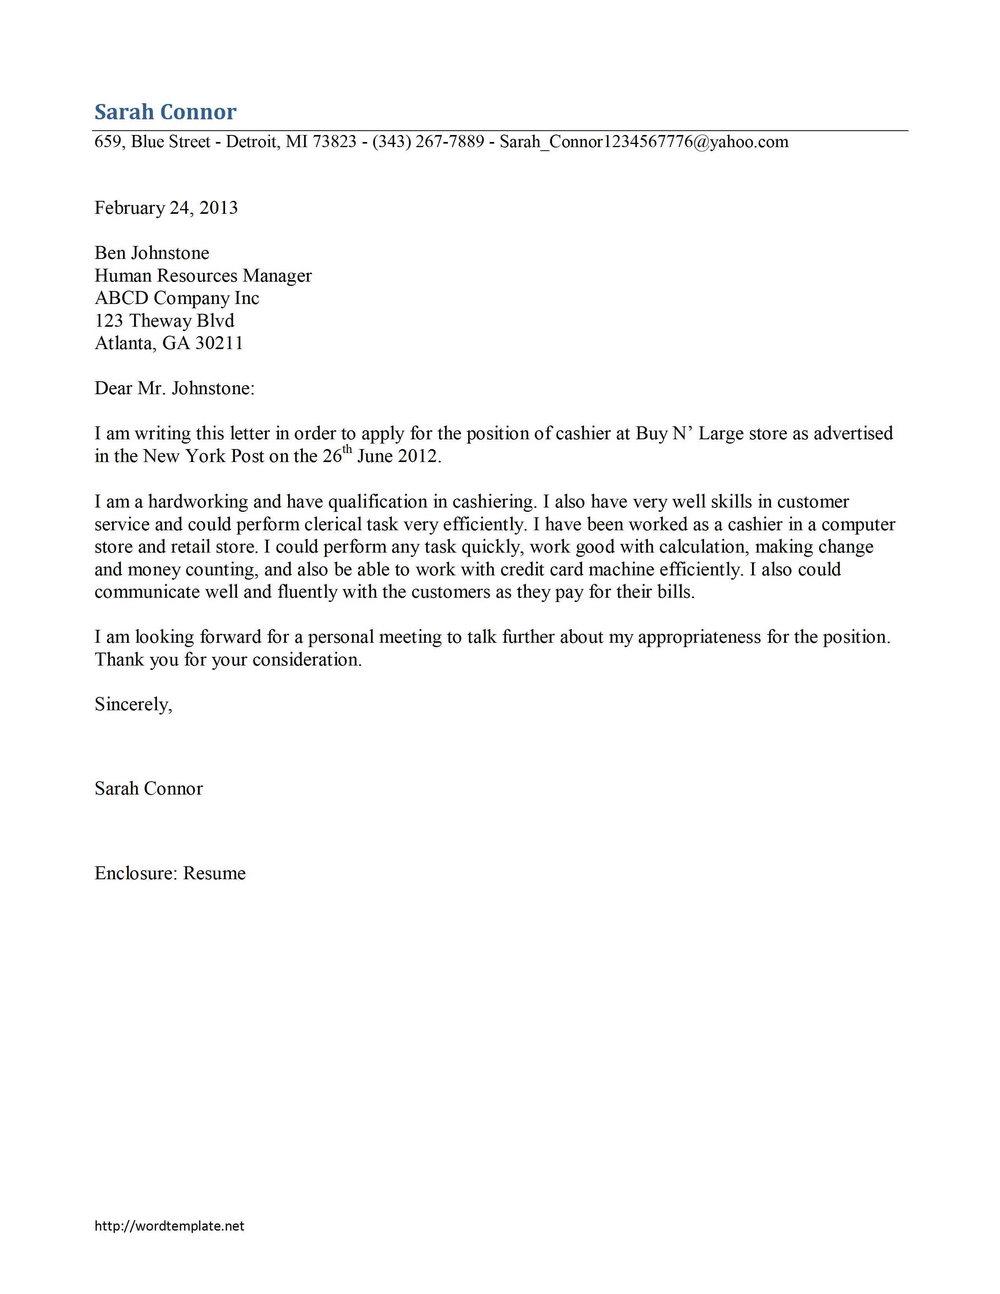 Free Cover Letter Builder Download